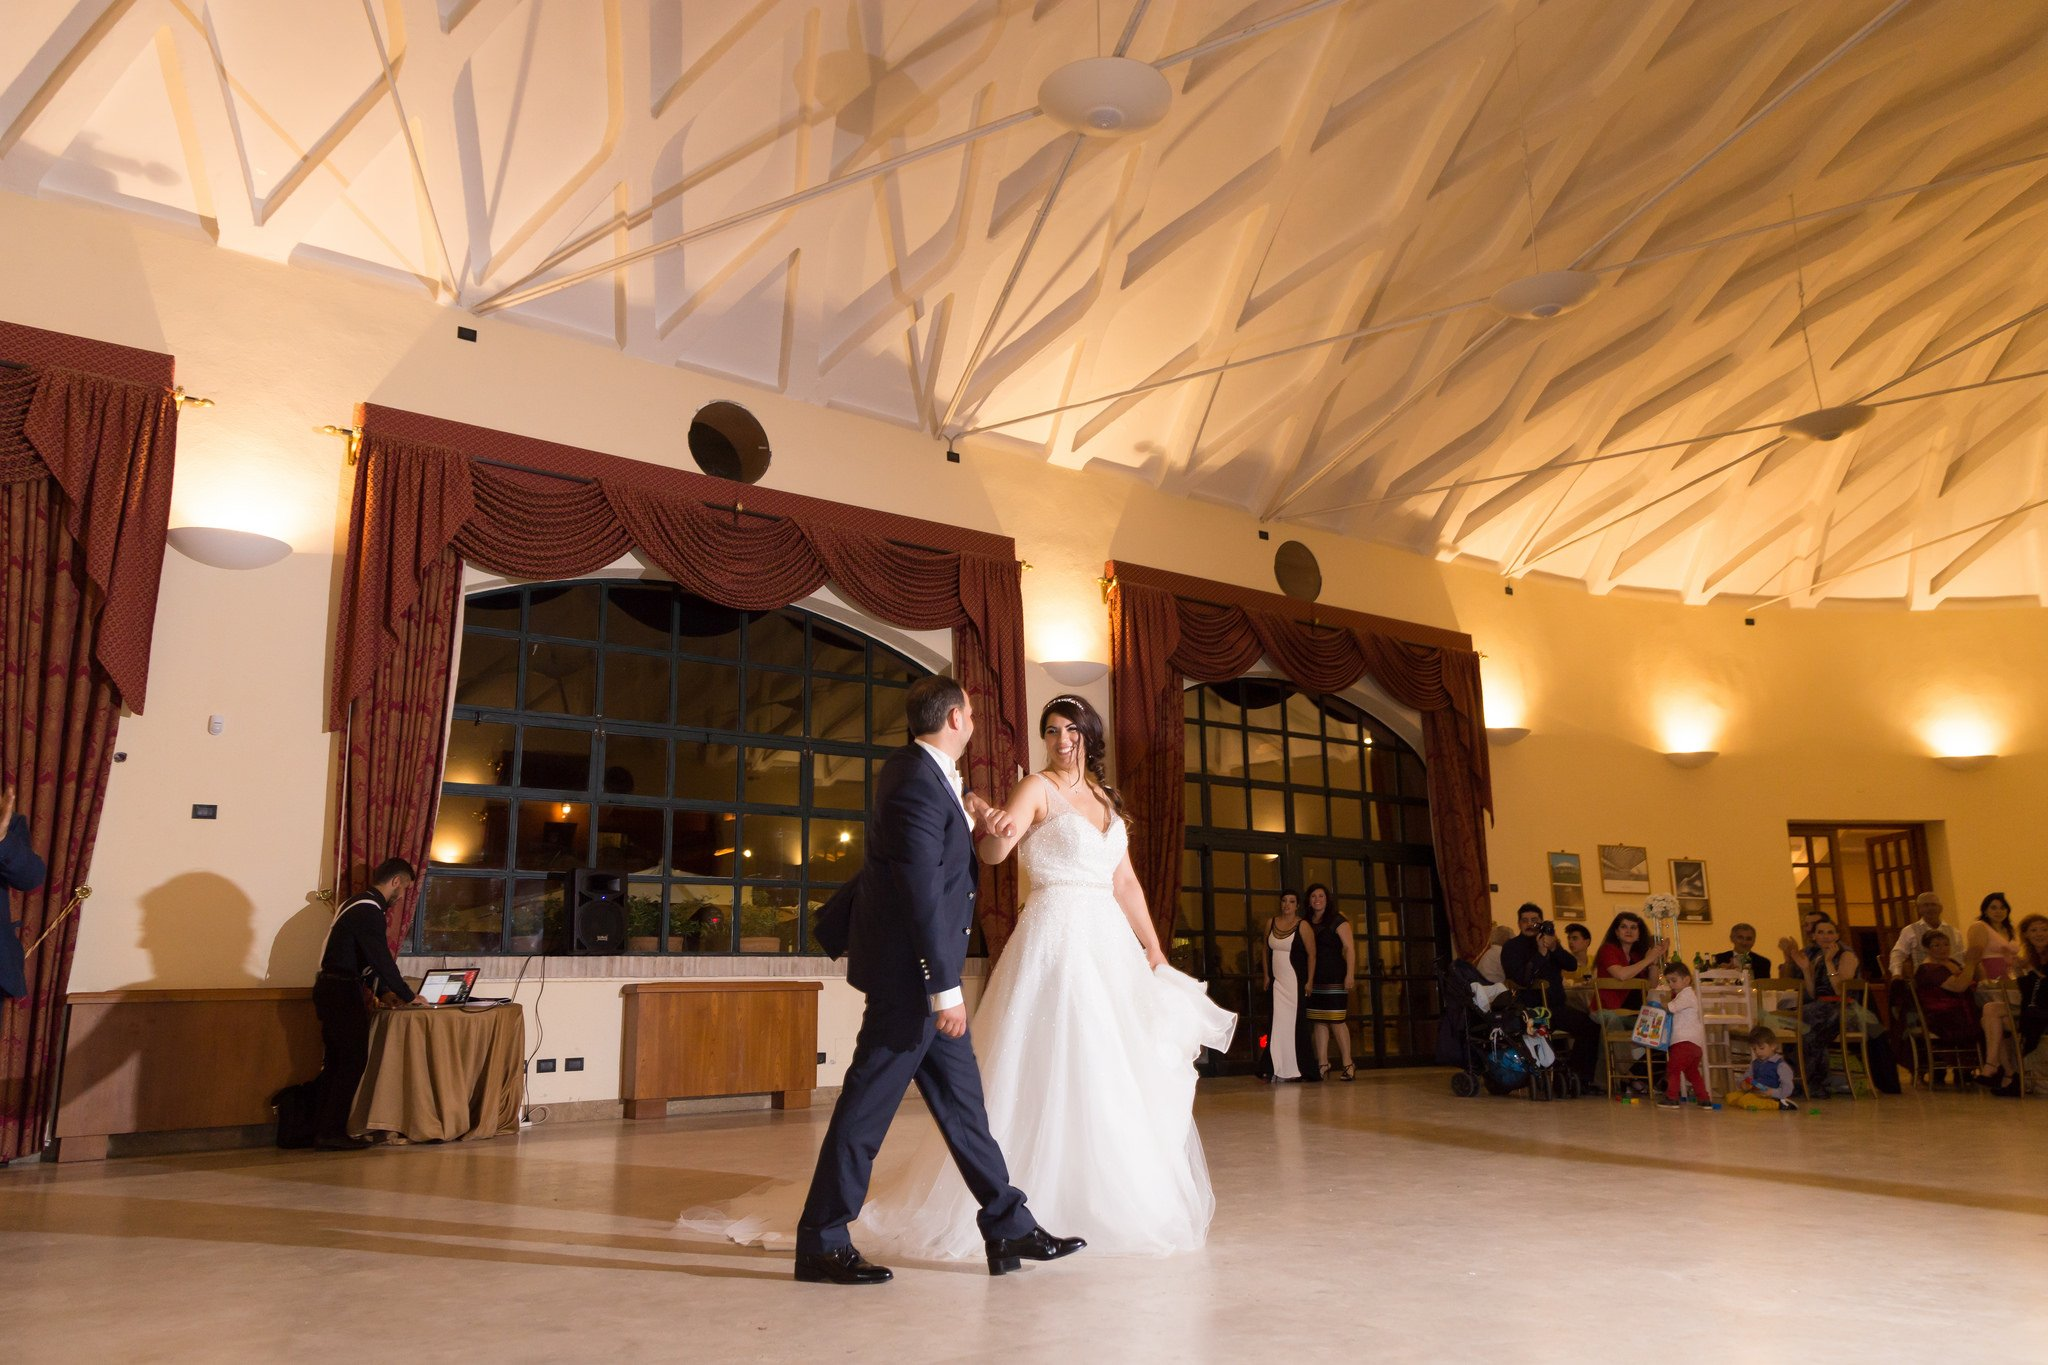 Matrimonio al Casale la corte di arenaro: Sala ricevimento